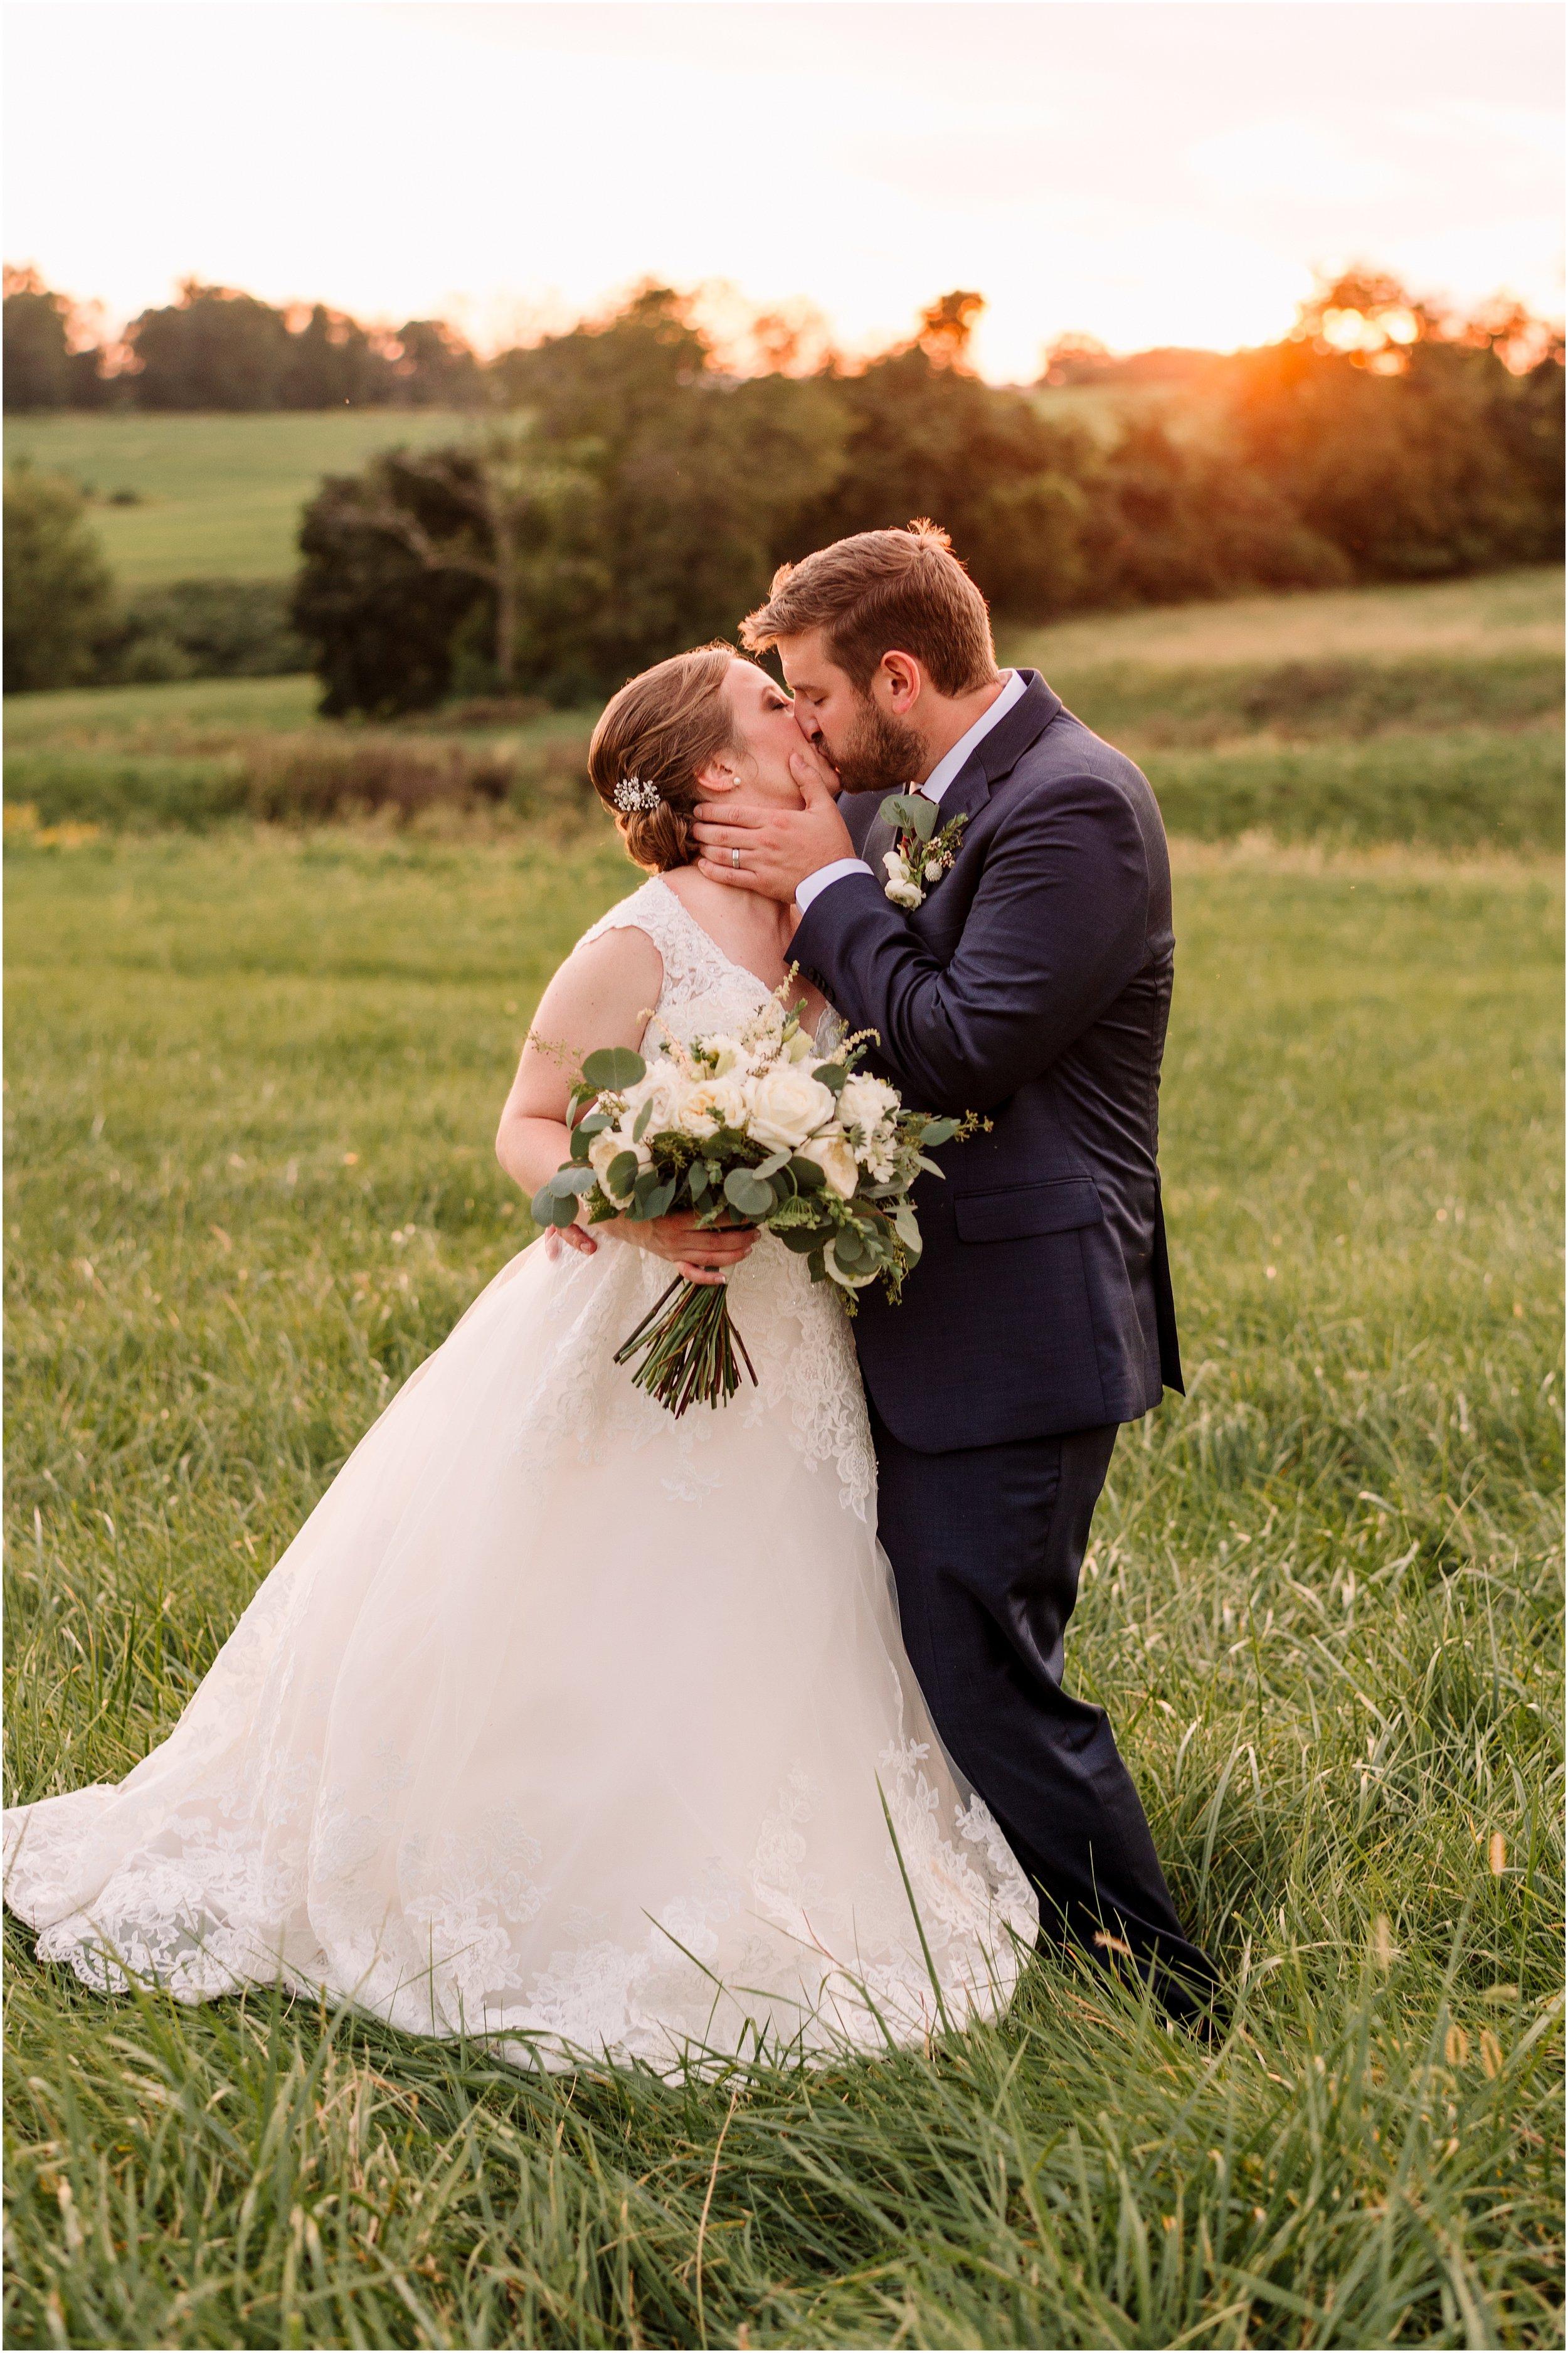 hannah leigh photography Wyndridge Farm Wedding York PA_1560.jpg